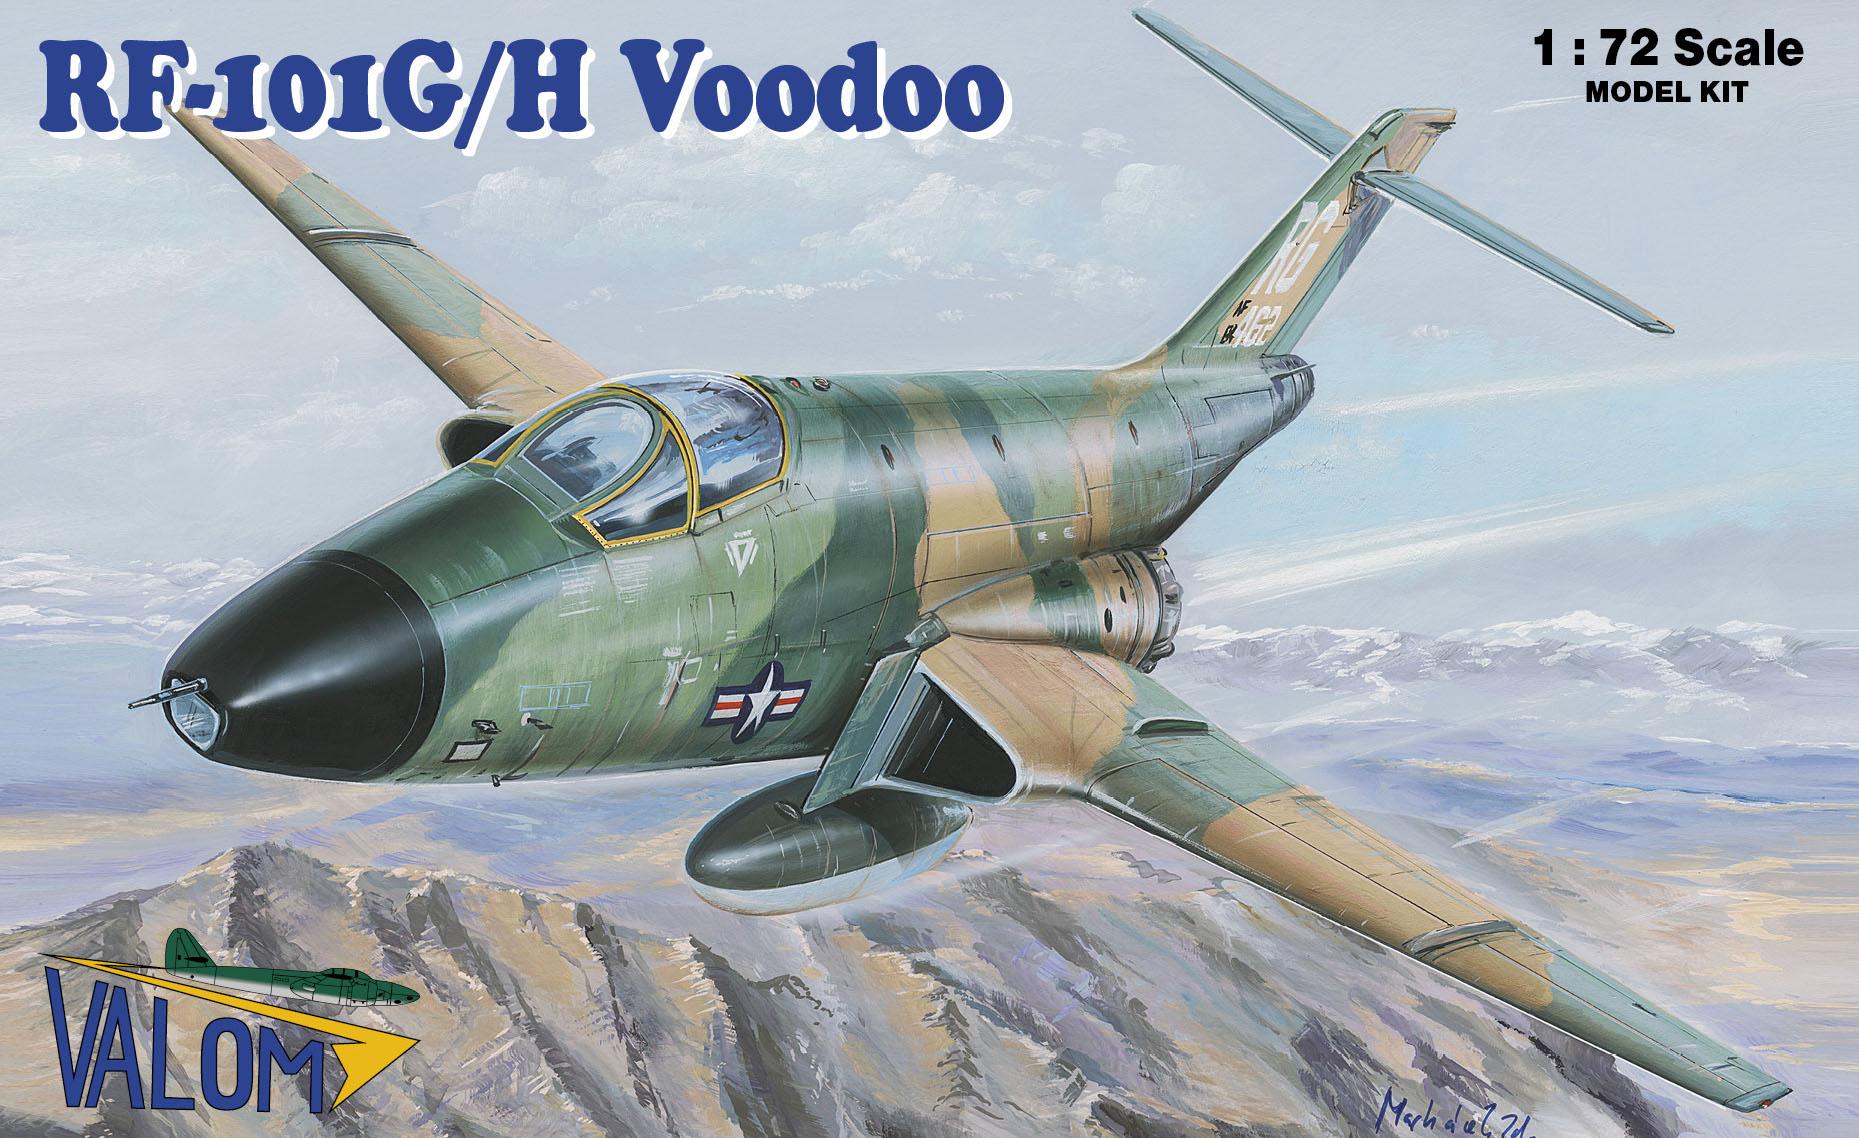 Valom RF-101G/H Voodoo